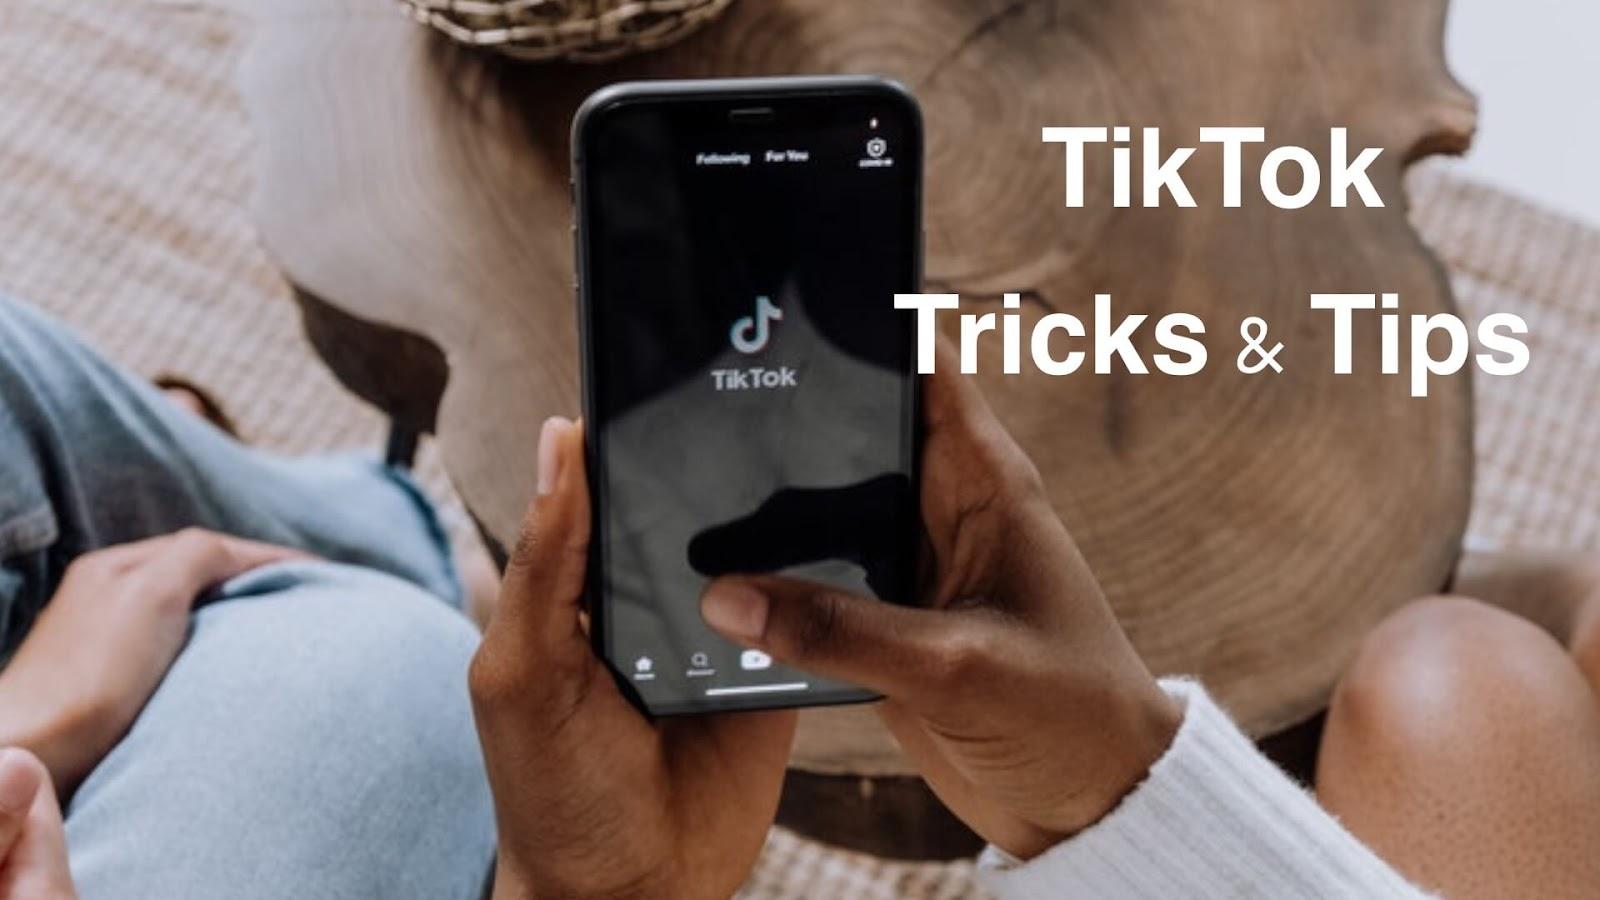 10 TikTok Tips and Tricks You Must Know - 2021